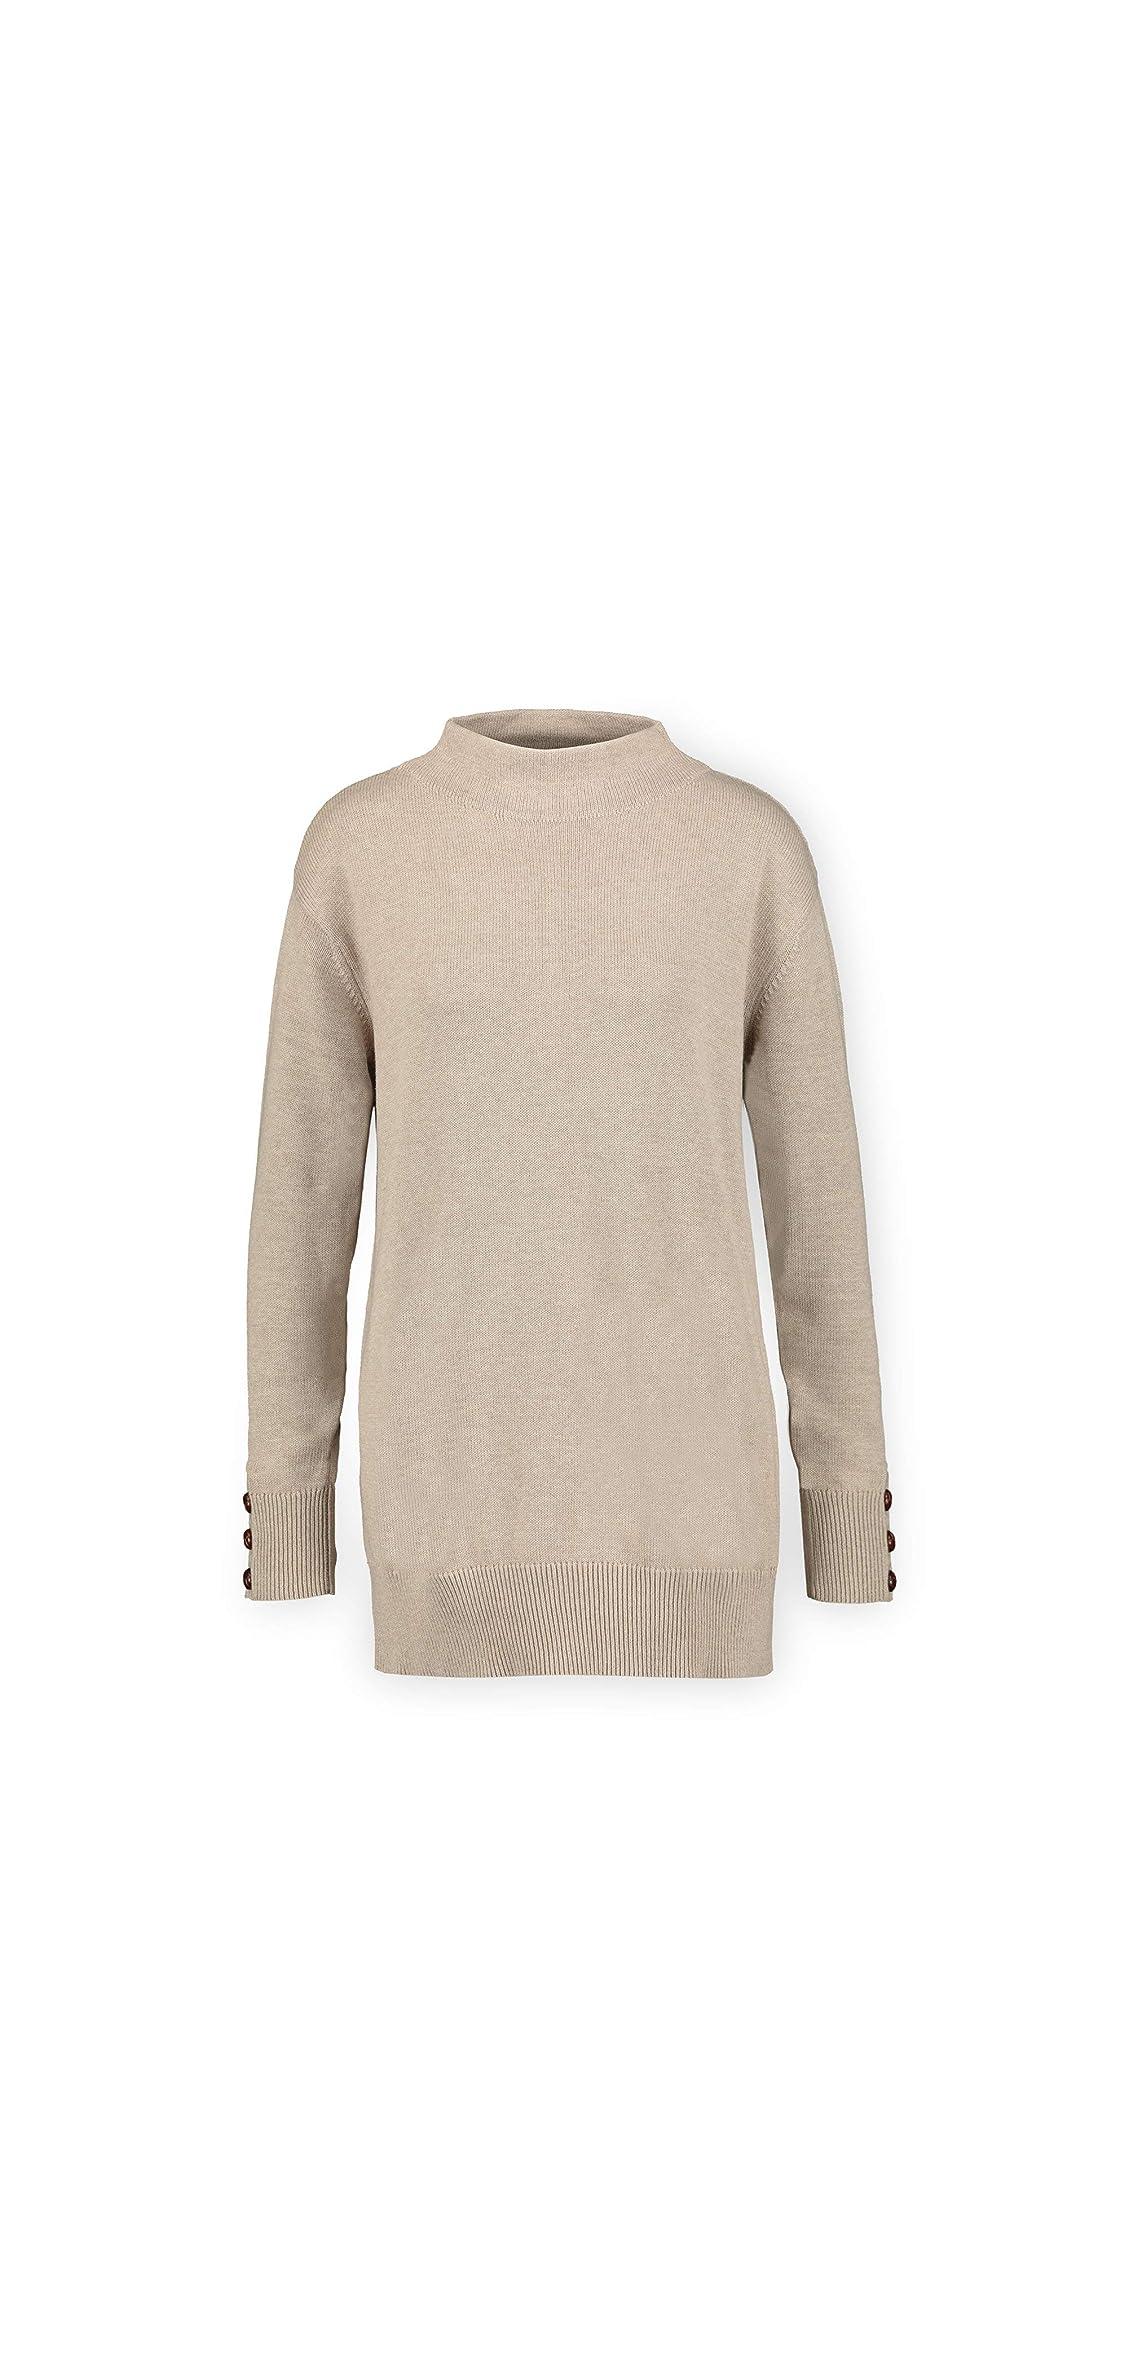 Women's Long Sleeve Funnel Neck Tunic Sweater